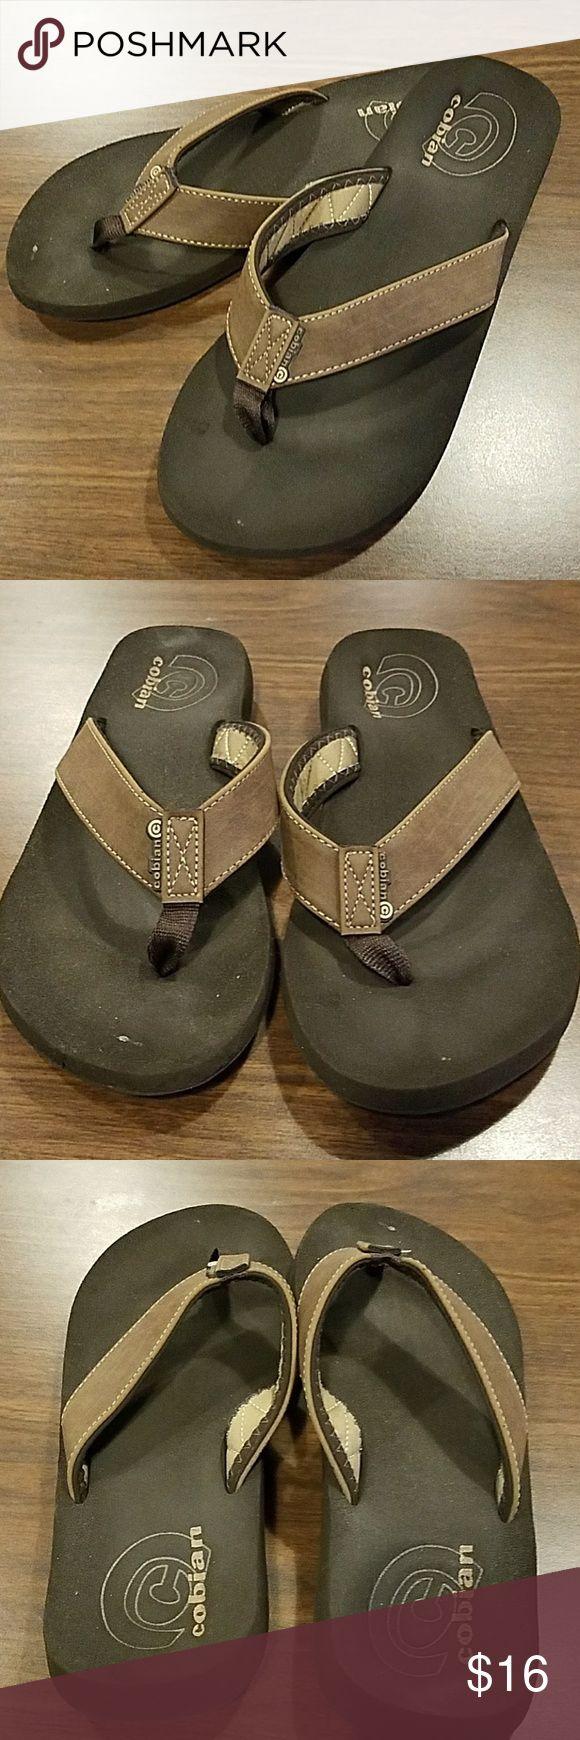 Cobian Flip Flops Men's Cobian Flip Flops Some mild wear but still in good shape. Size 13 Cobian Shoes Sandals & Flip-Flops